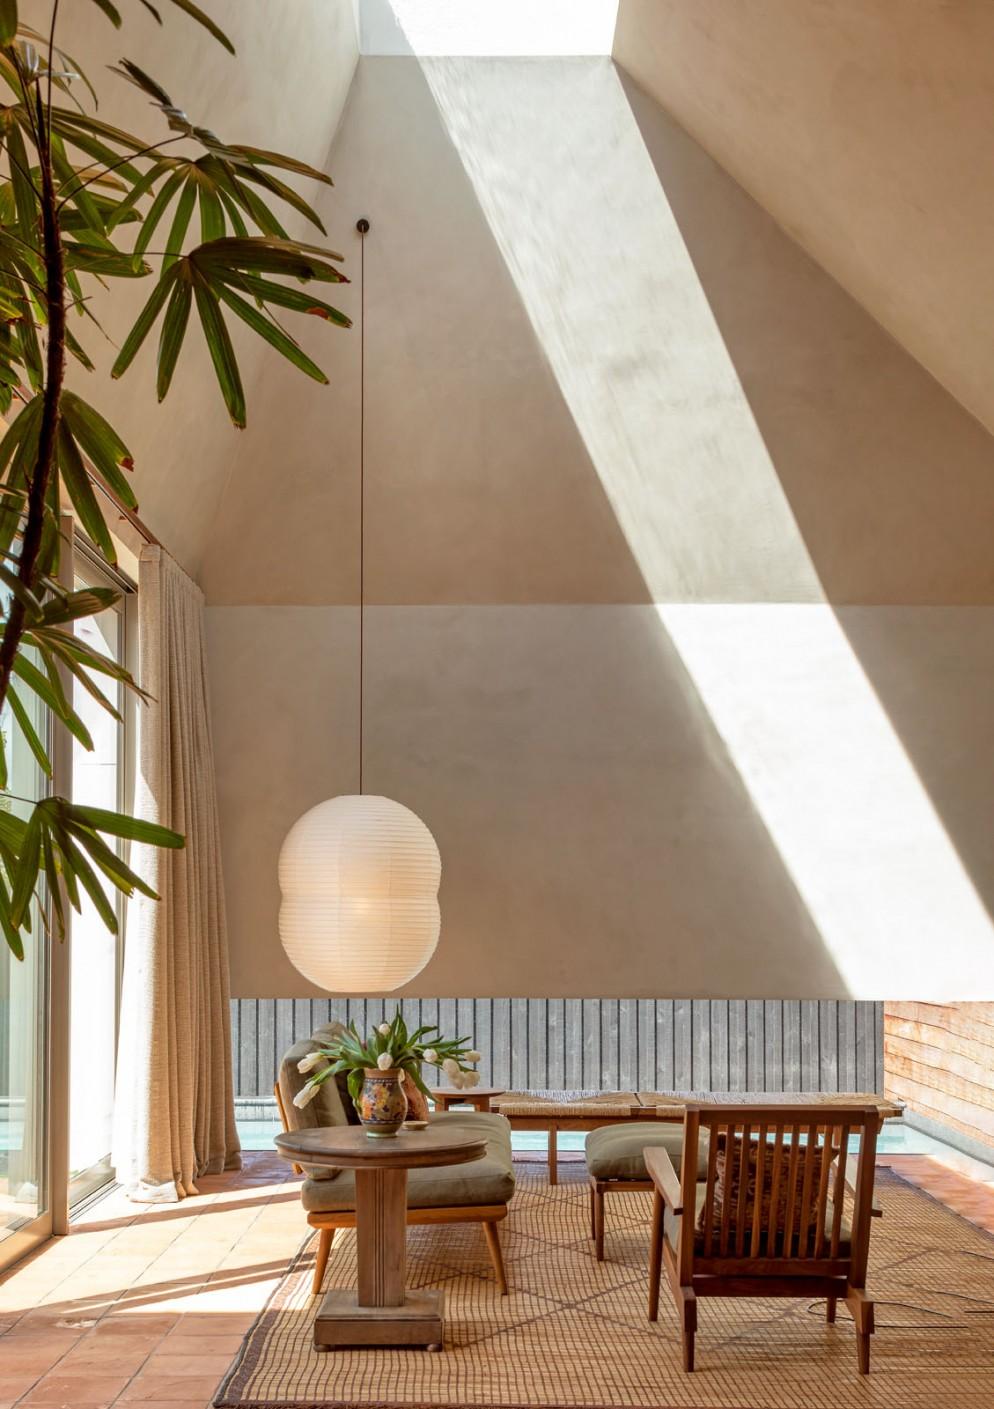 casa-nuova-zelanda-katie-lockhart02